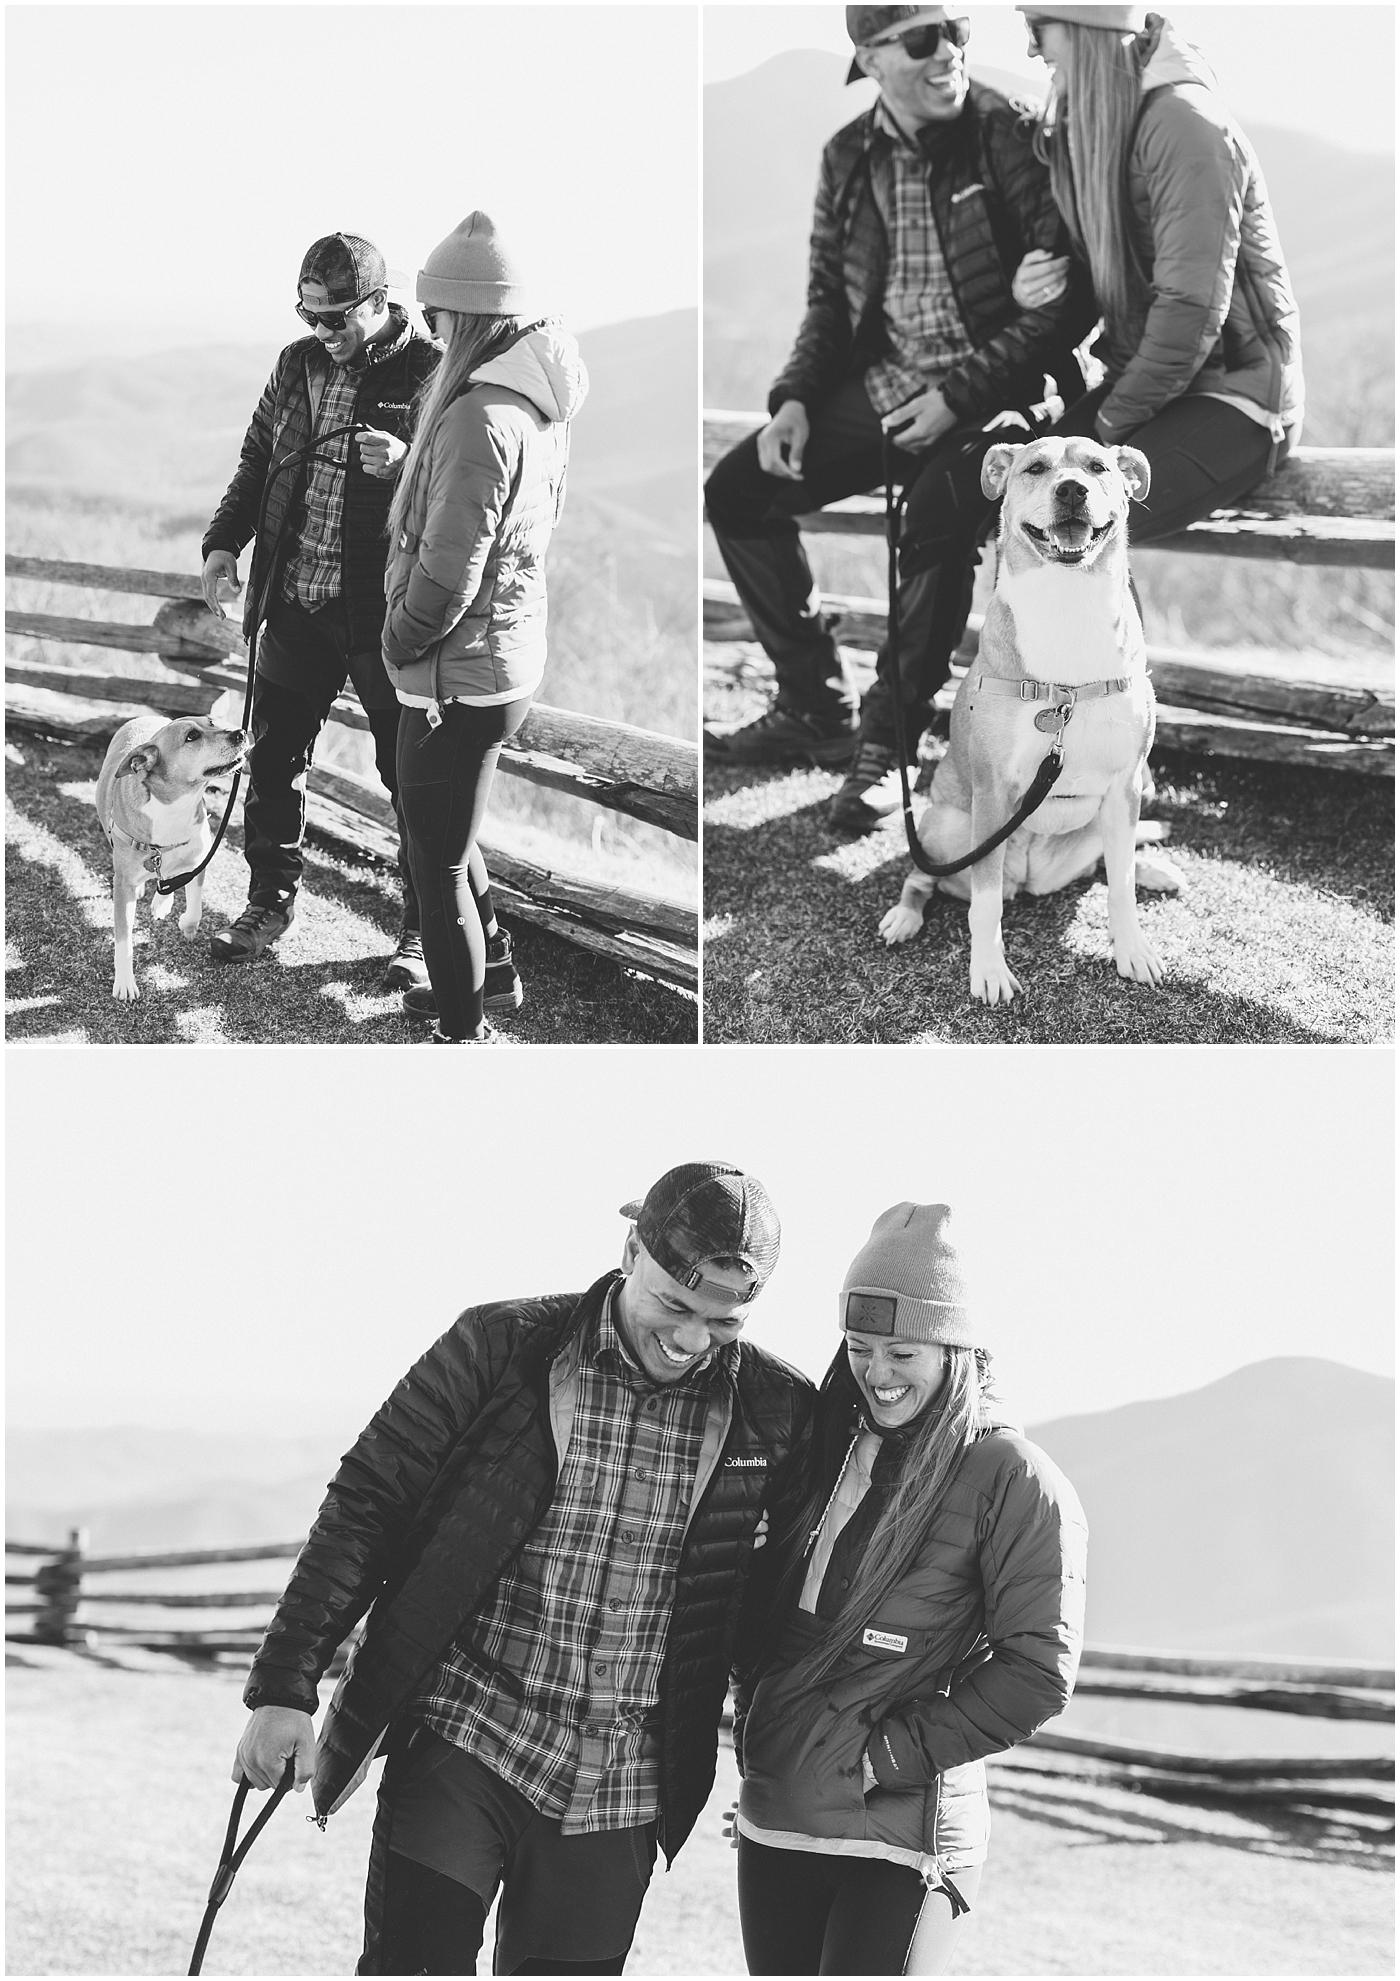 wintergreen resort couple hiking photography jessica ryan photography